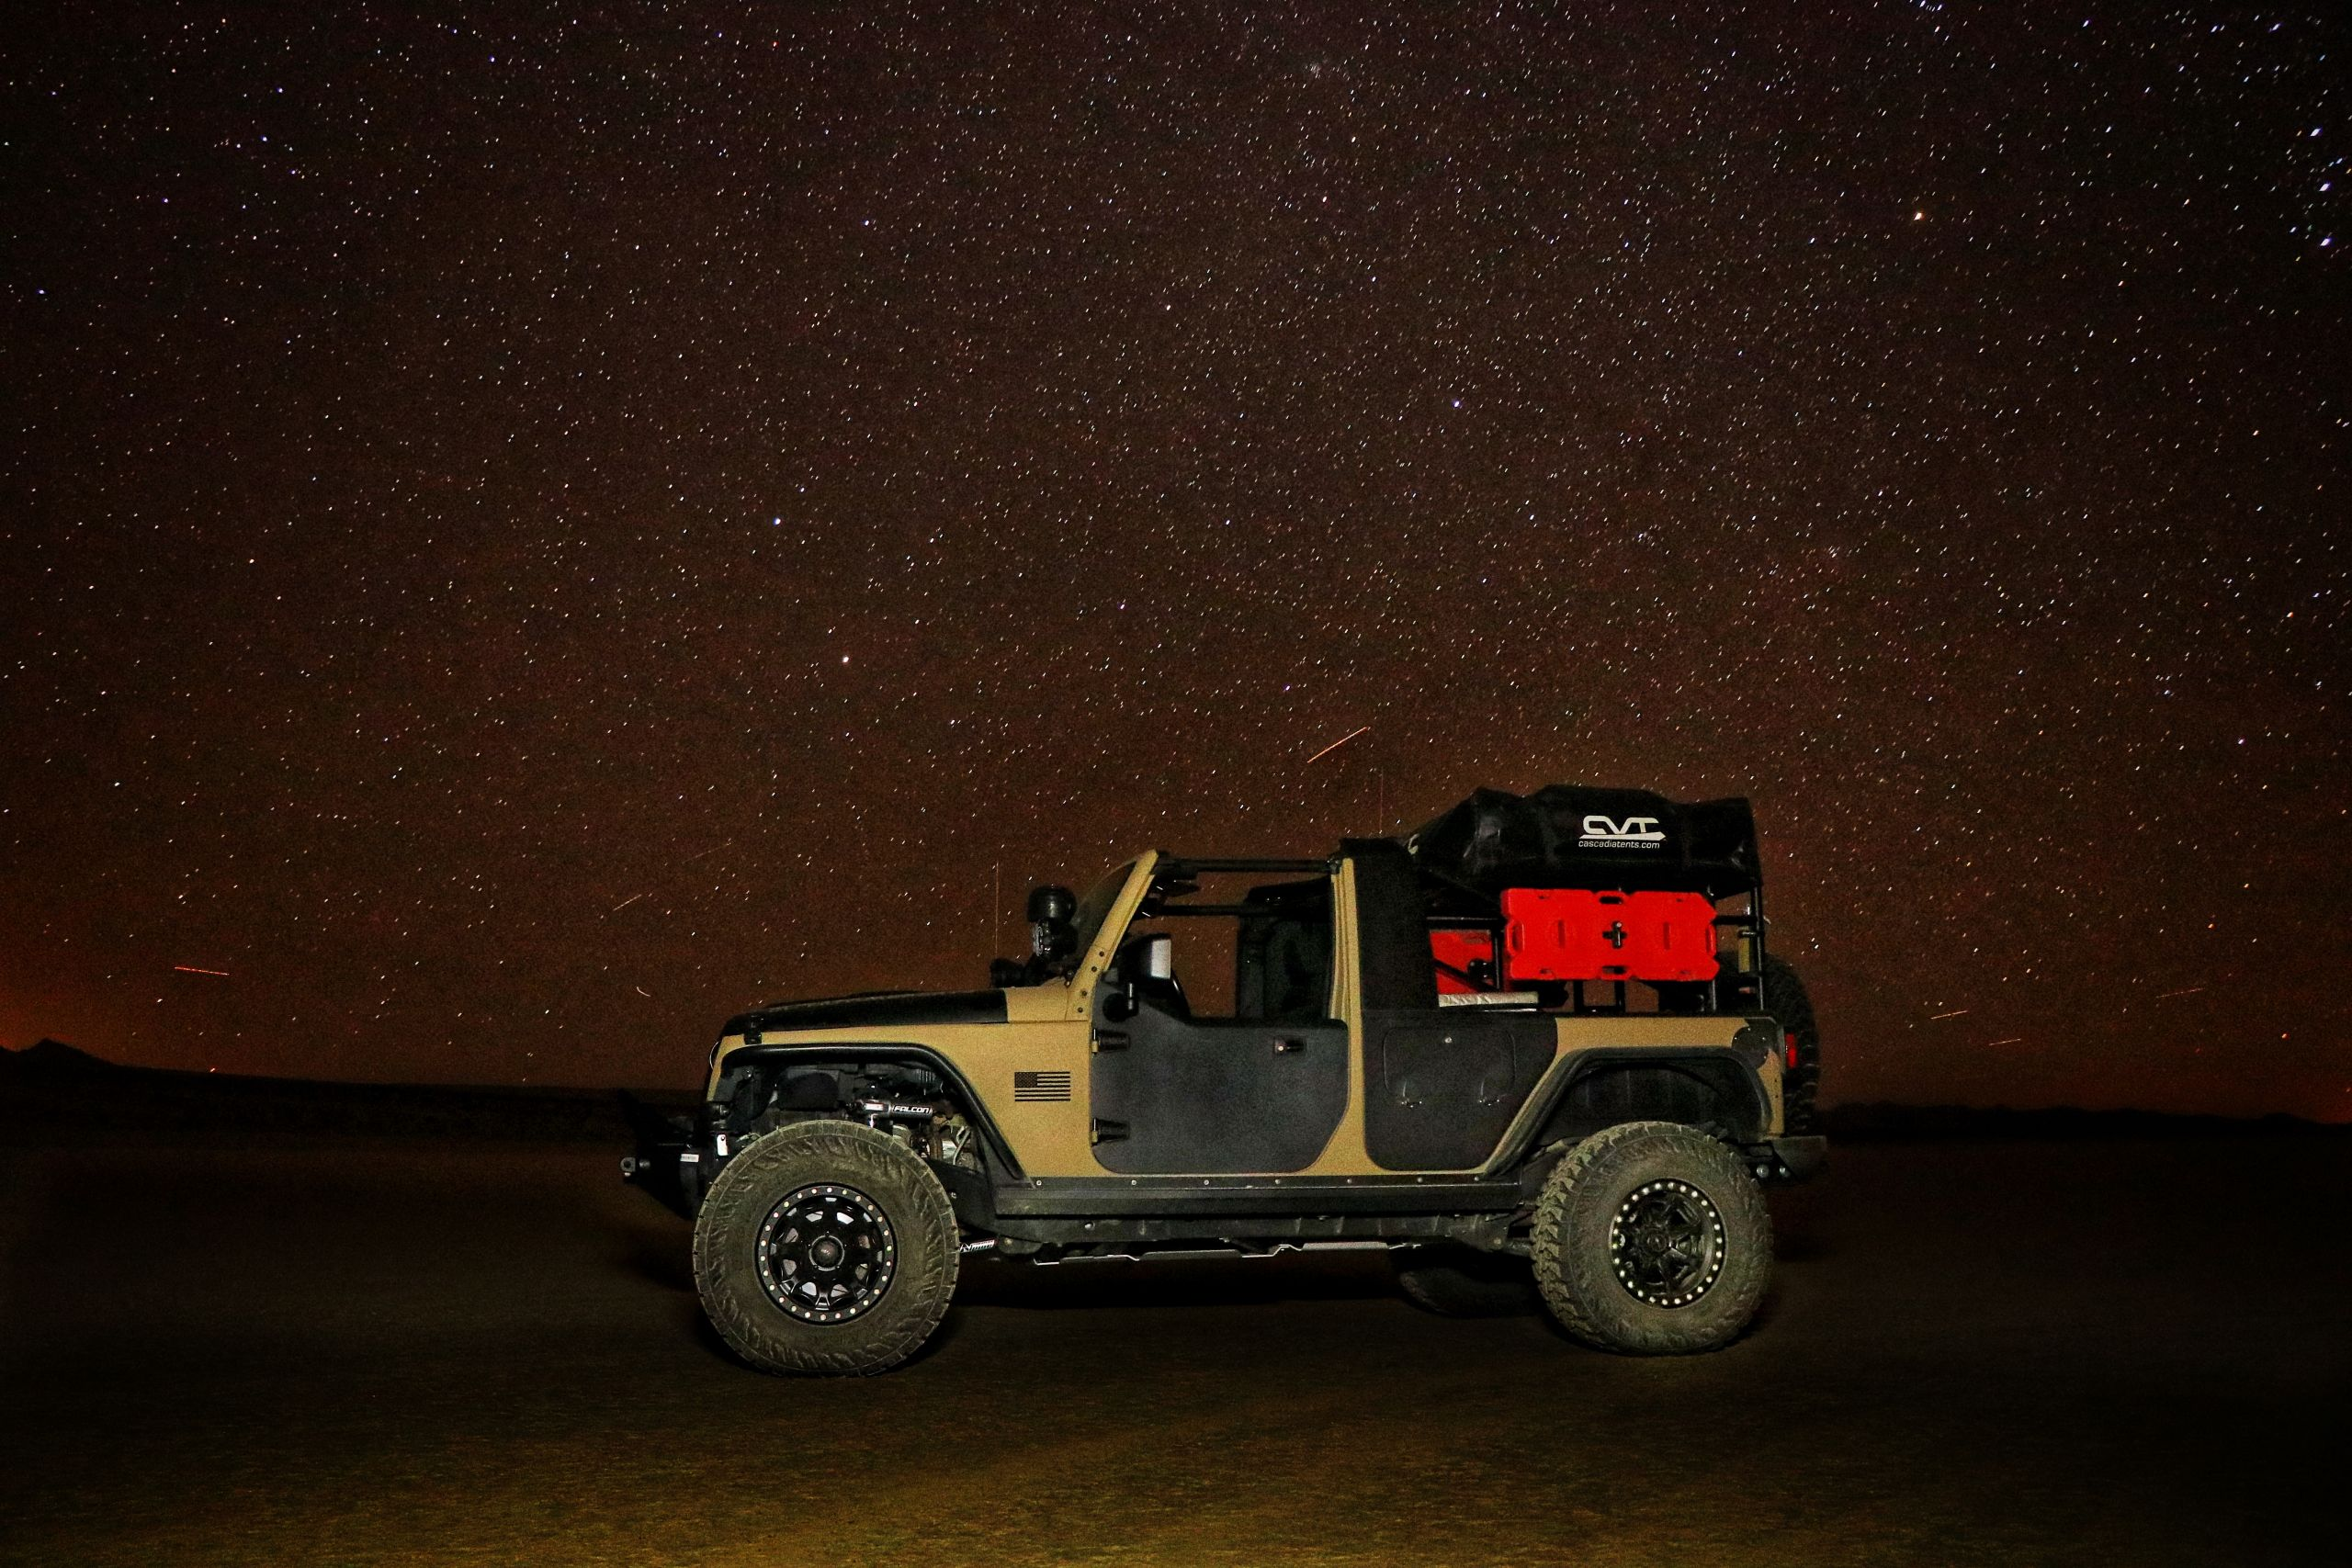 Custom Off Road, Overlanding & Camping Jeep JK Build - Image #02